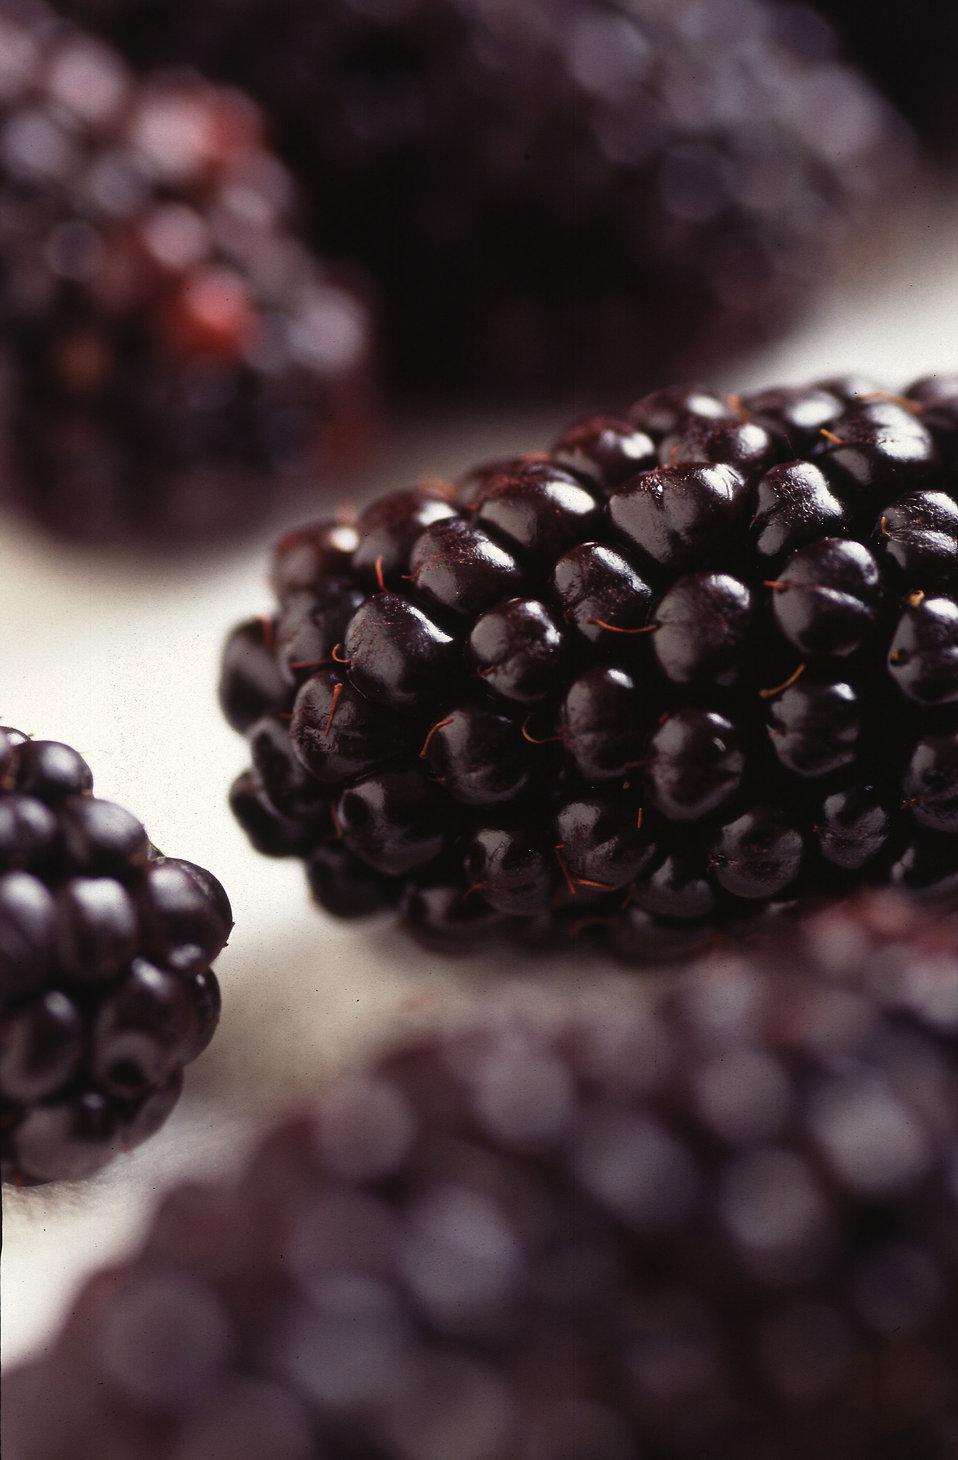 Closeup of blackberries : Free Stock Photo